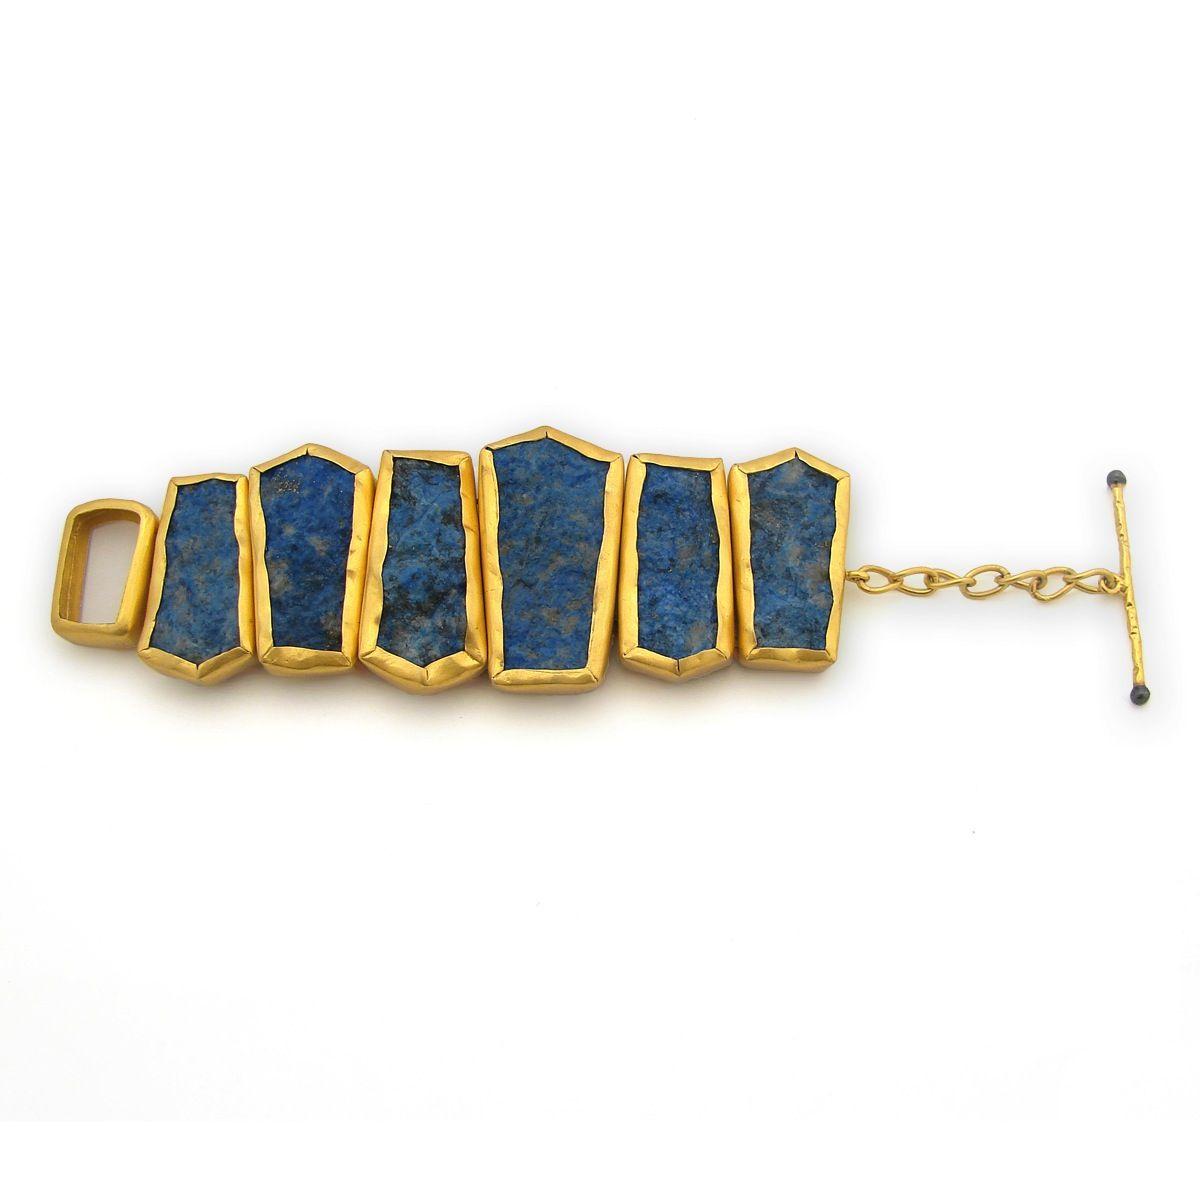 The Stonehenge Bracelet by SHANTTI JEWELS